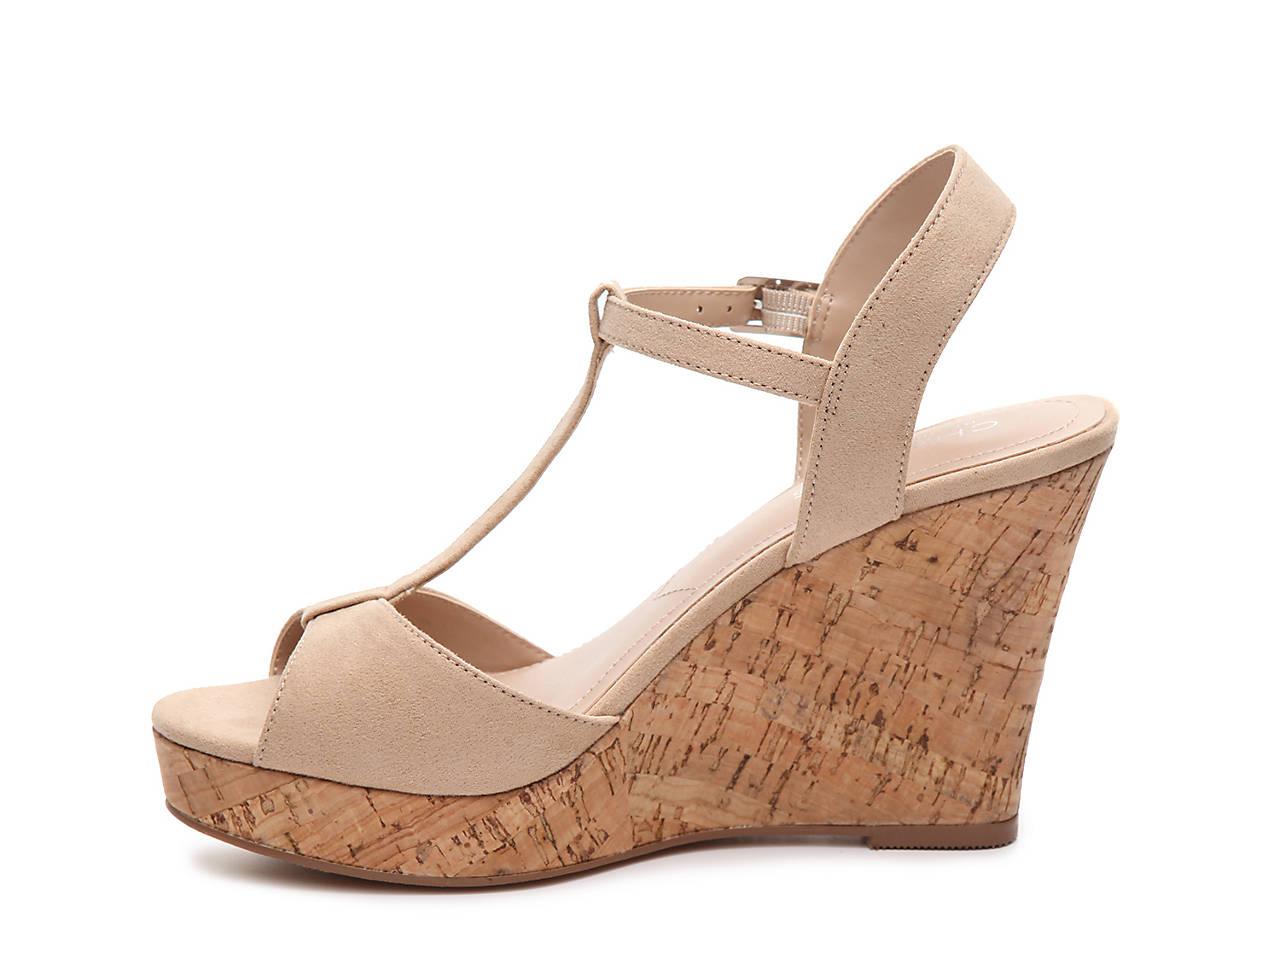 65de68079e Charles by Charles David Lucas Wedge Sandal Women's Shoes | DSW